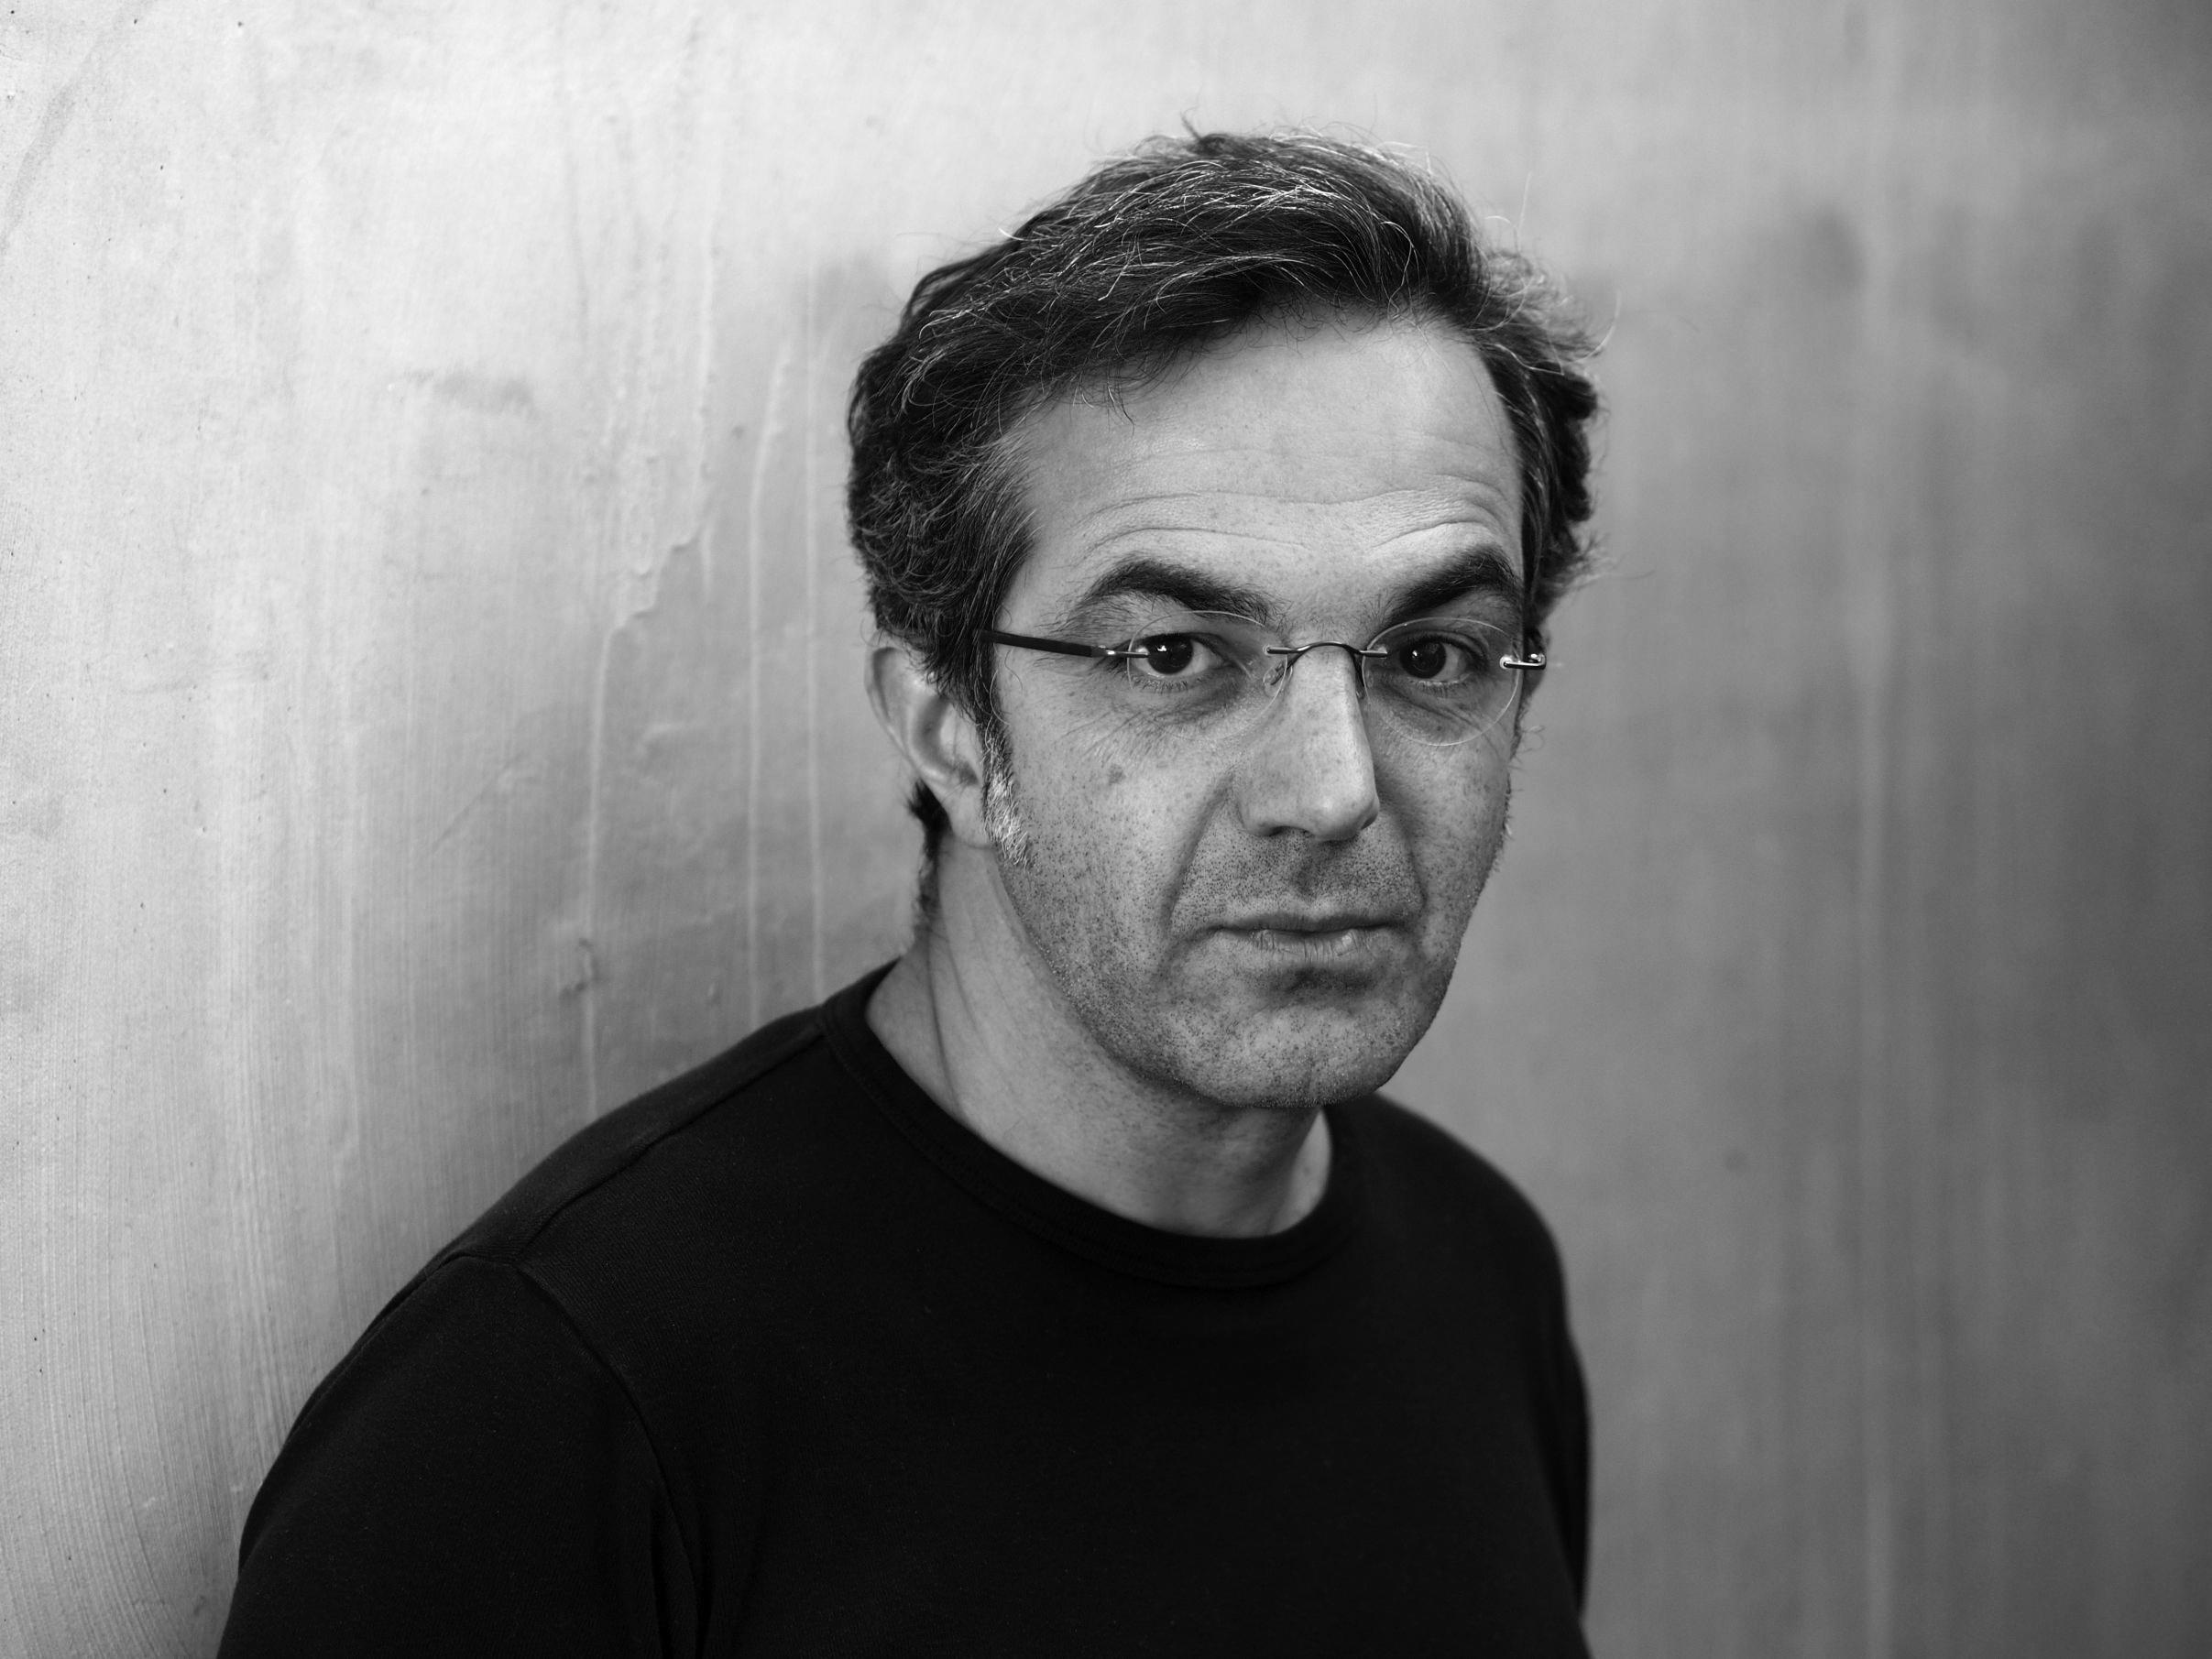 Portraitfotos Kalender/09_16 Kermani_Navid_c_Peter-Andreas Hassiepensw.jpg